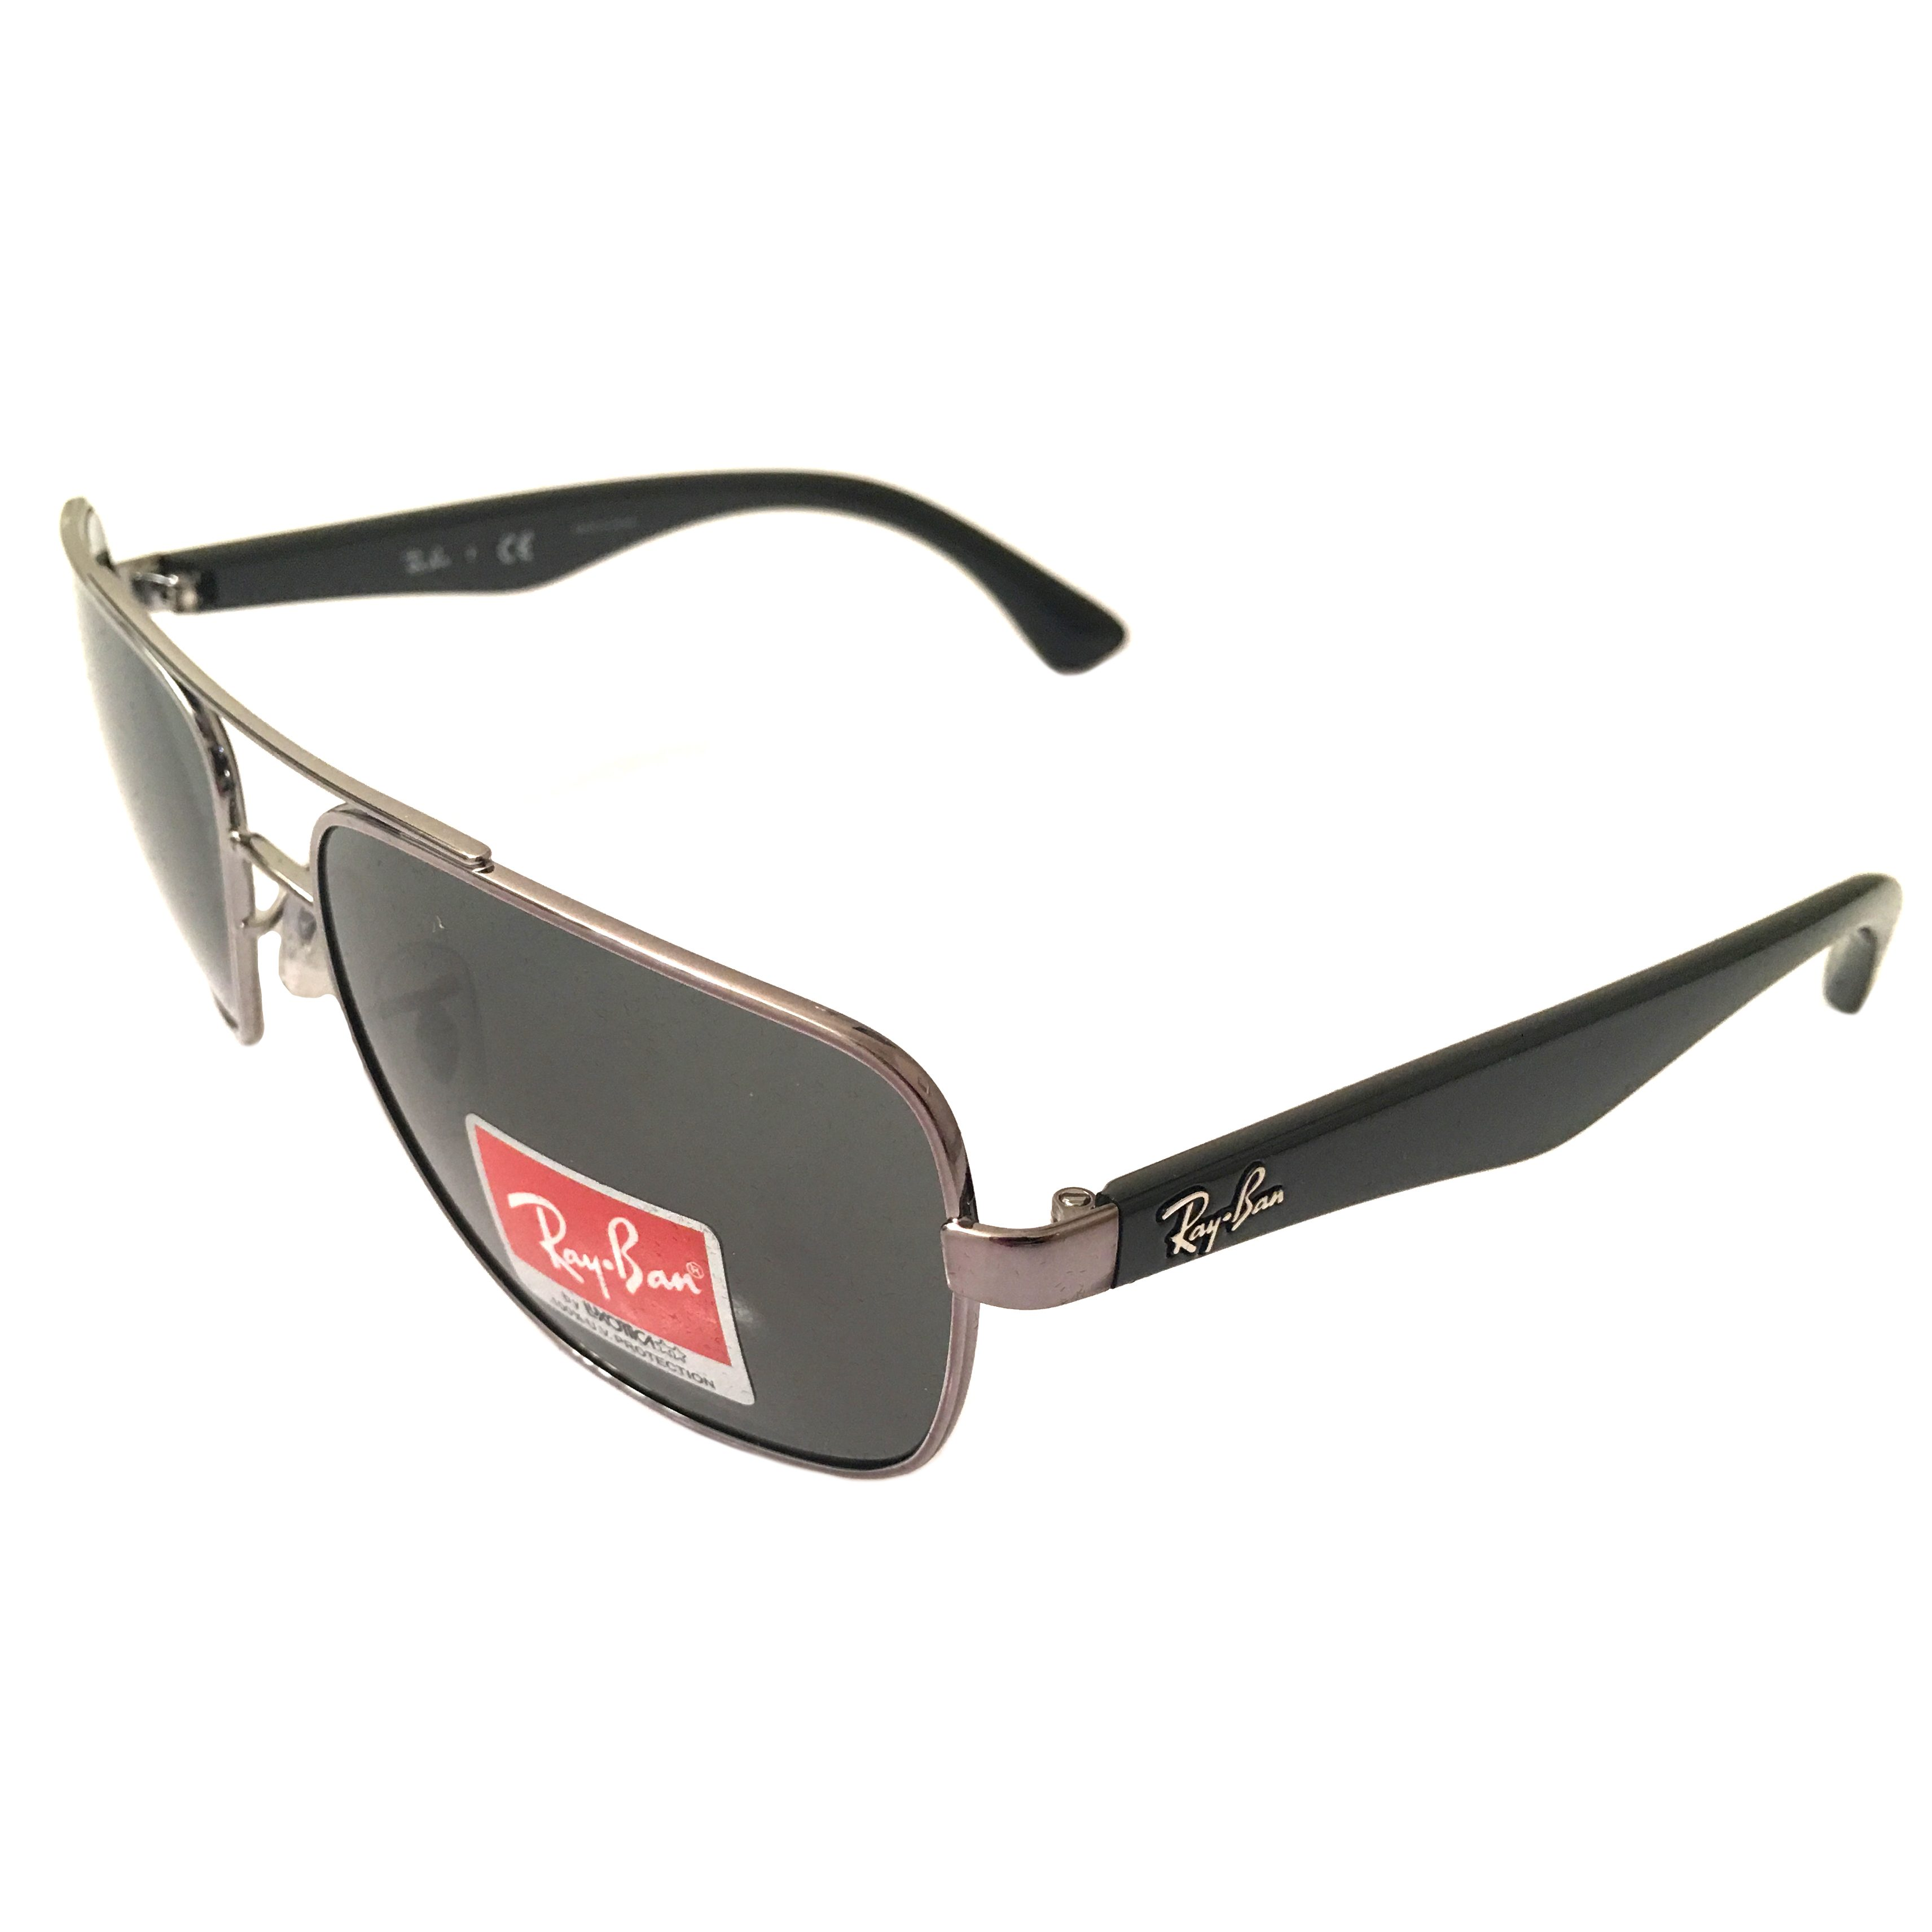 Ray-Ban Aviator Sunglasses - Gunmetal w/ Black - Dark Green Lens RB3483 004/71